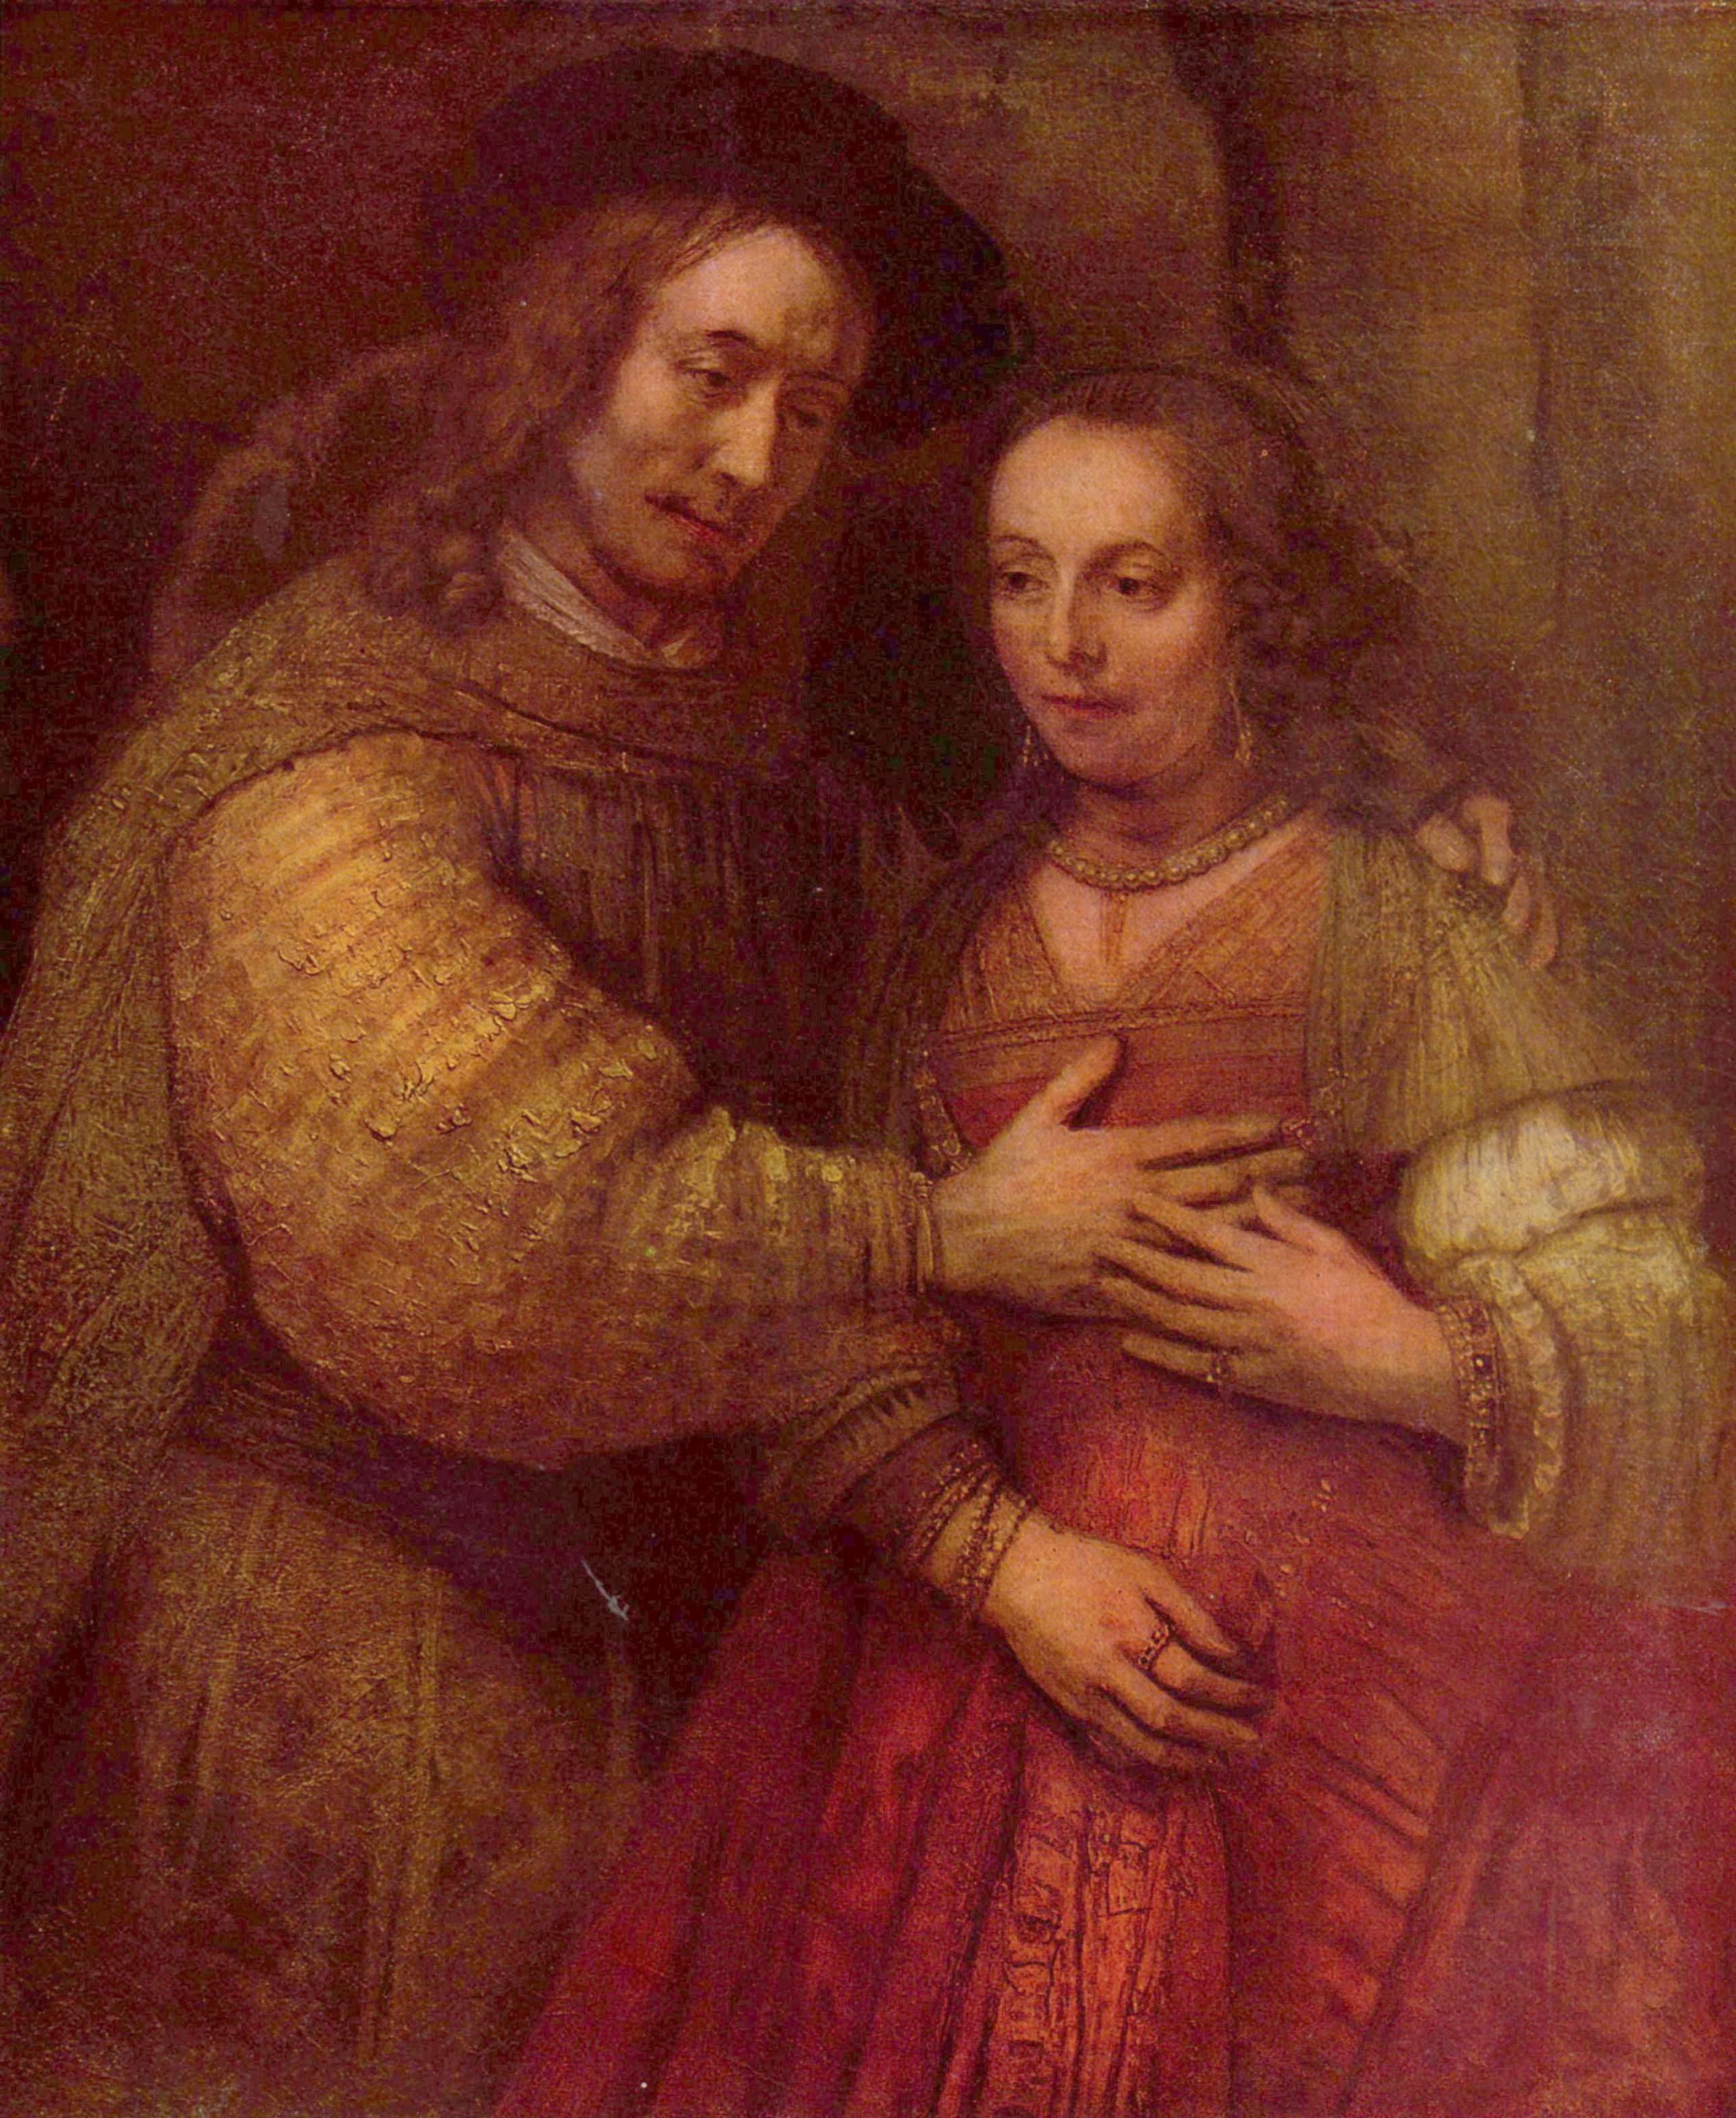 REMBRANDT Harmenszoon van Rijn Man The Jewish Bride c1666